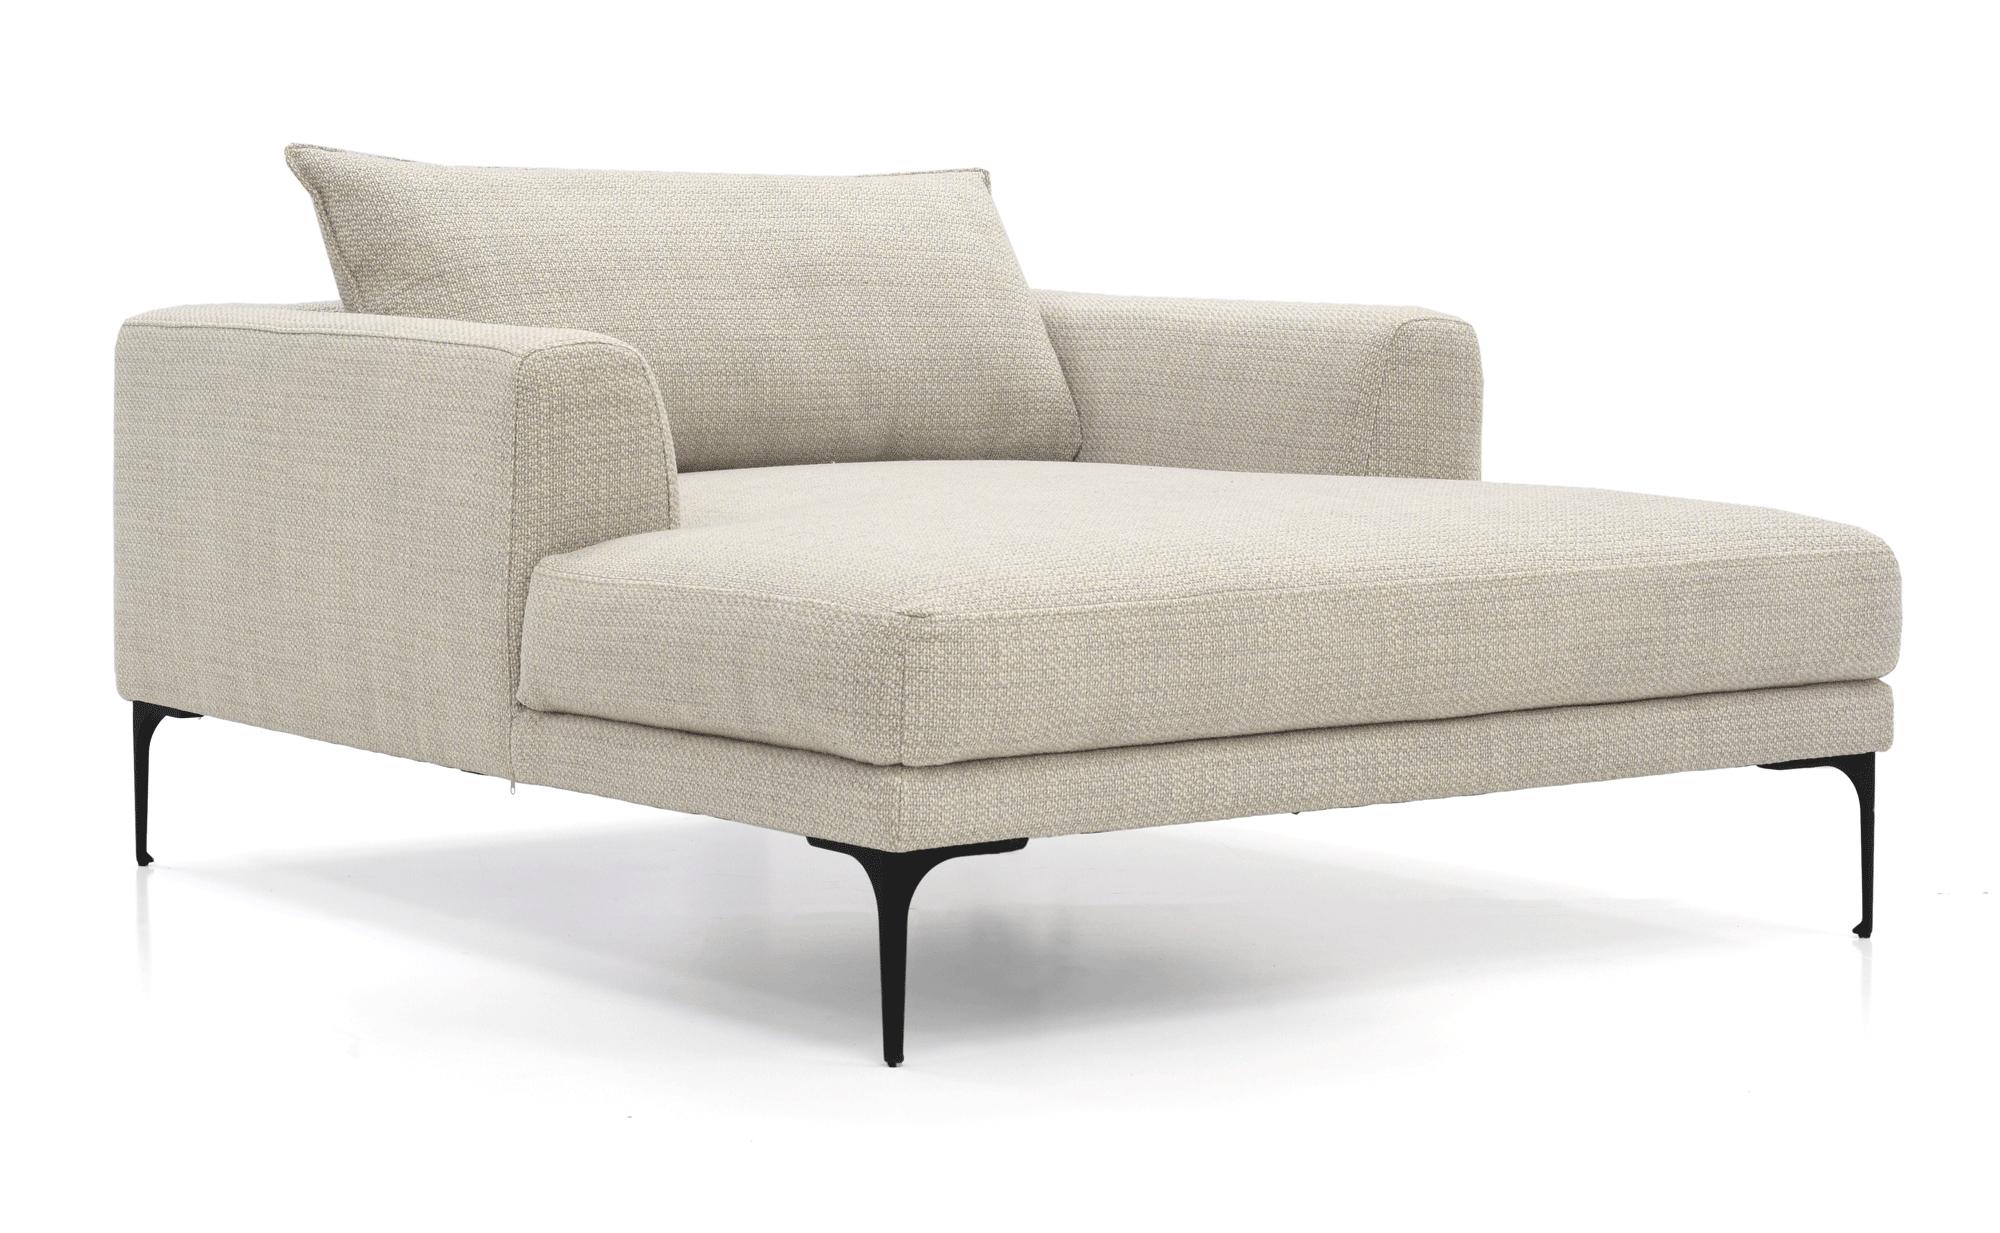 Astonishing Modern Furniture Contemporary Furniture Cantoni Beatyapartments Chair Design Images Beatyapartmentscom